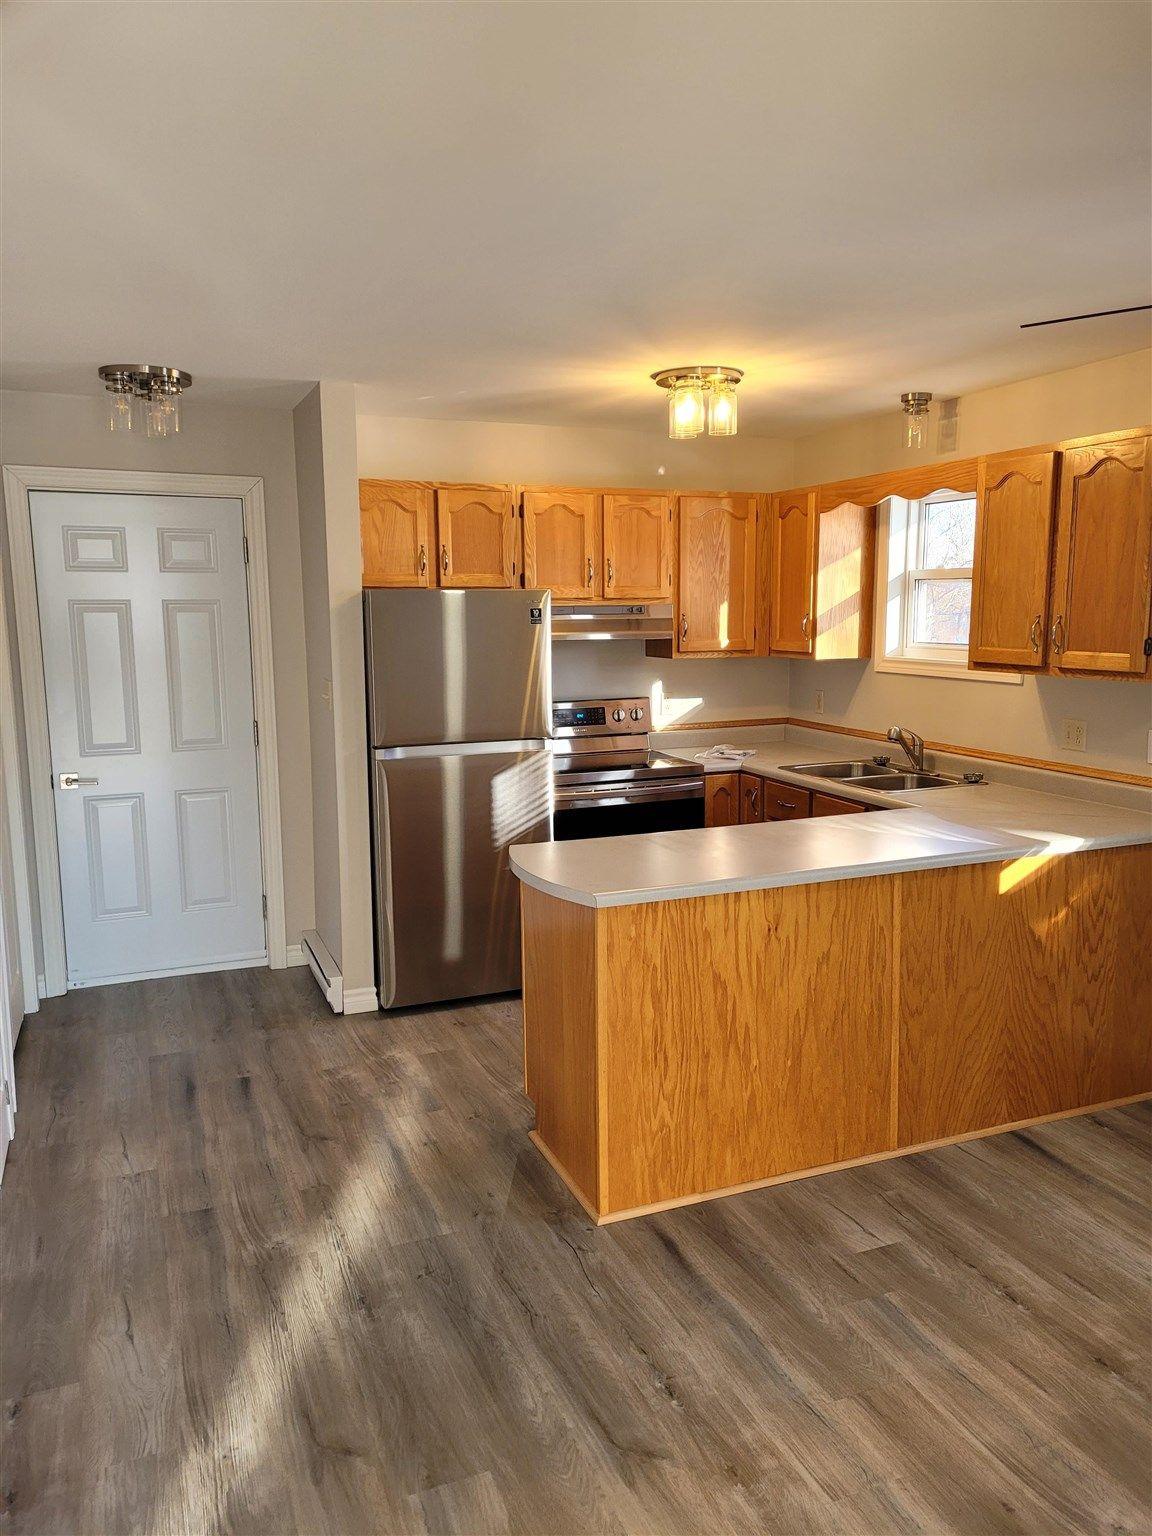 Main Photo: 121 123 Poplar Street in Glace Bay: 203-Glace Bay Residential for sale (Cape Breton)  : MLS®# 202115043